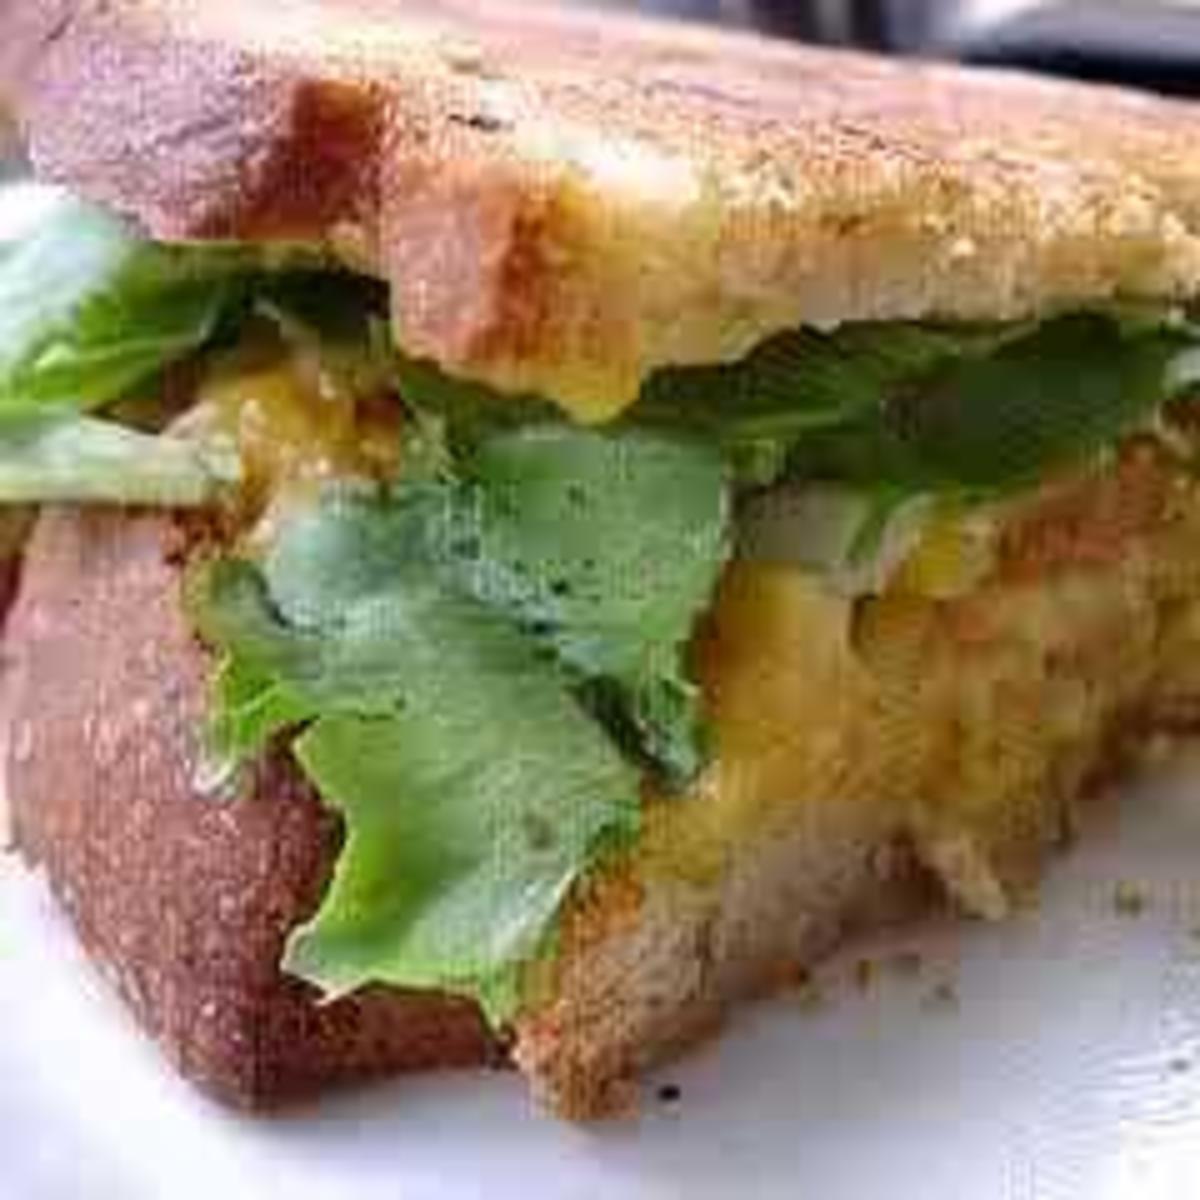 A classic egg salad sandwich